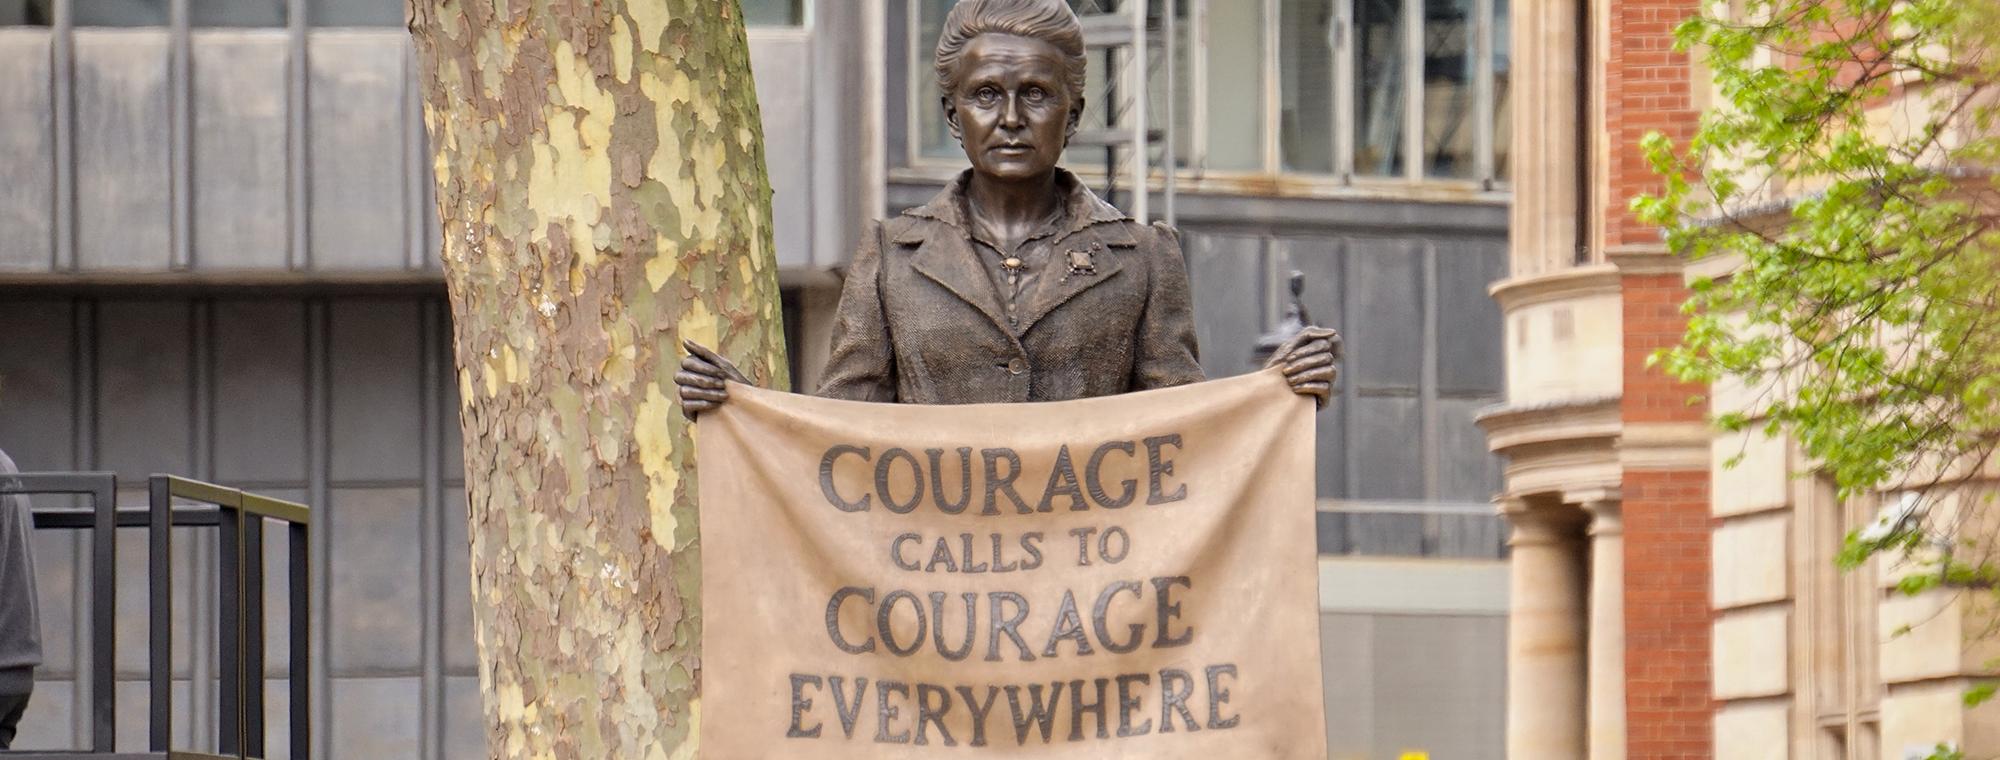 Statue of British suffragist Millicent Fawcett in Parliament Square, London, England